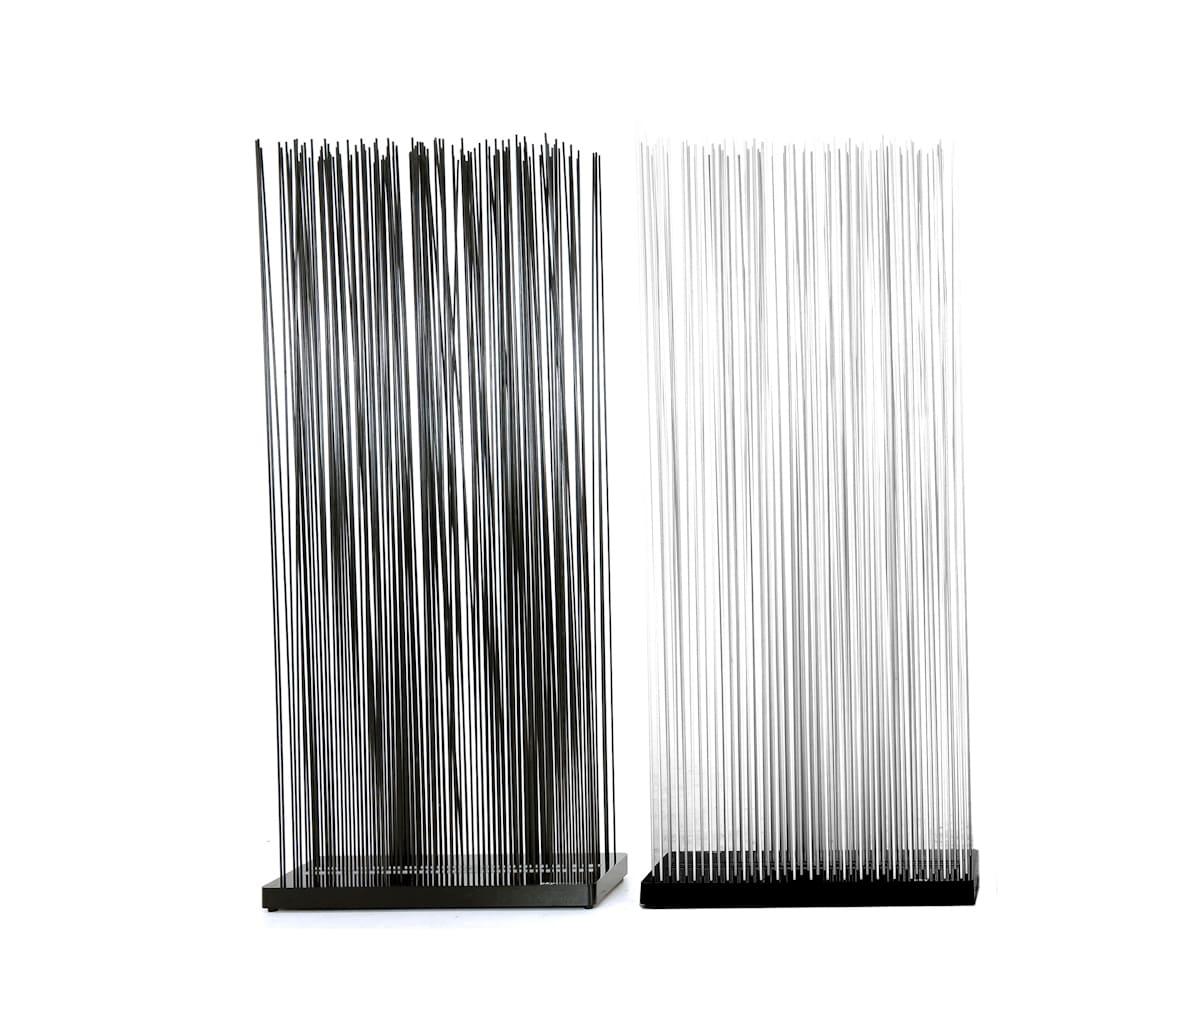 Full Size of Paravent Outdoor Glas Holz Amazon Garten Metall Bambus Polyrattan Balkon Ikea Skydesignnews Küche Kaufen Edelstahl Wohnzimmer Paravent Outdoor